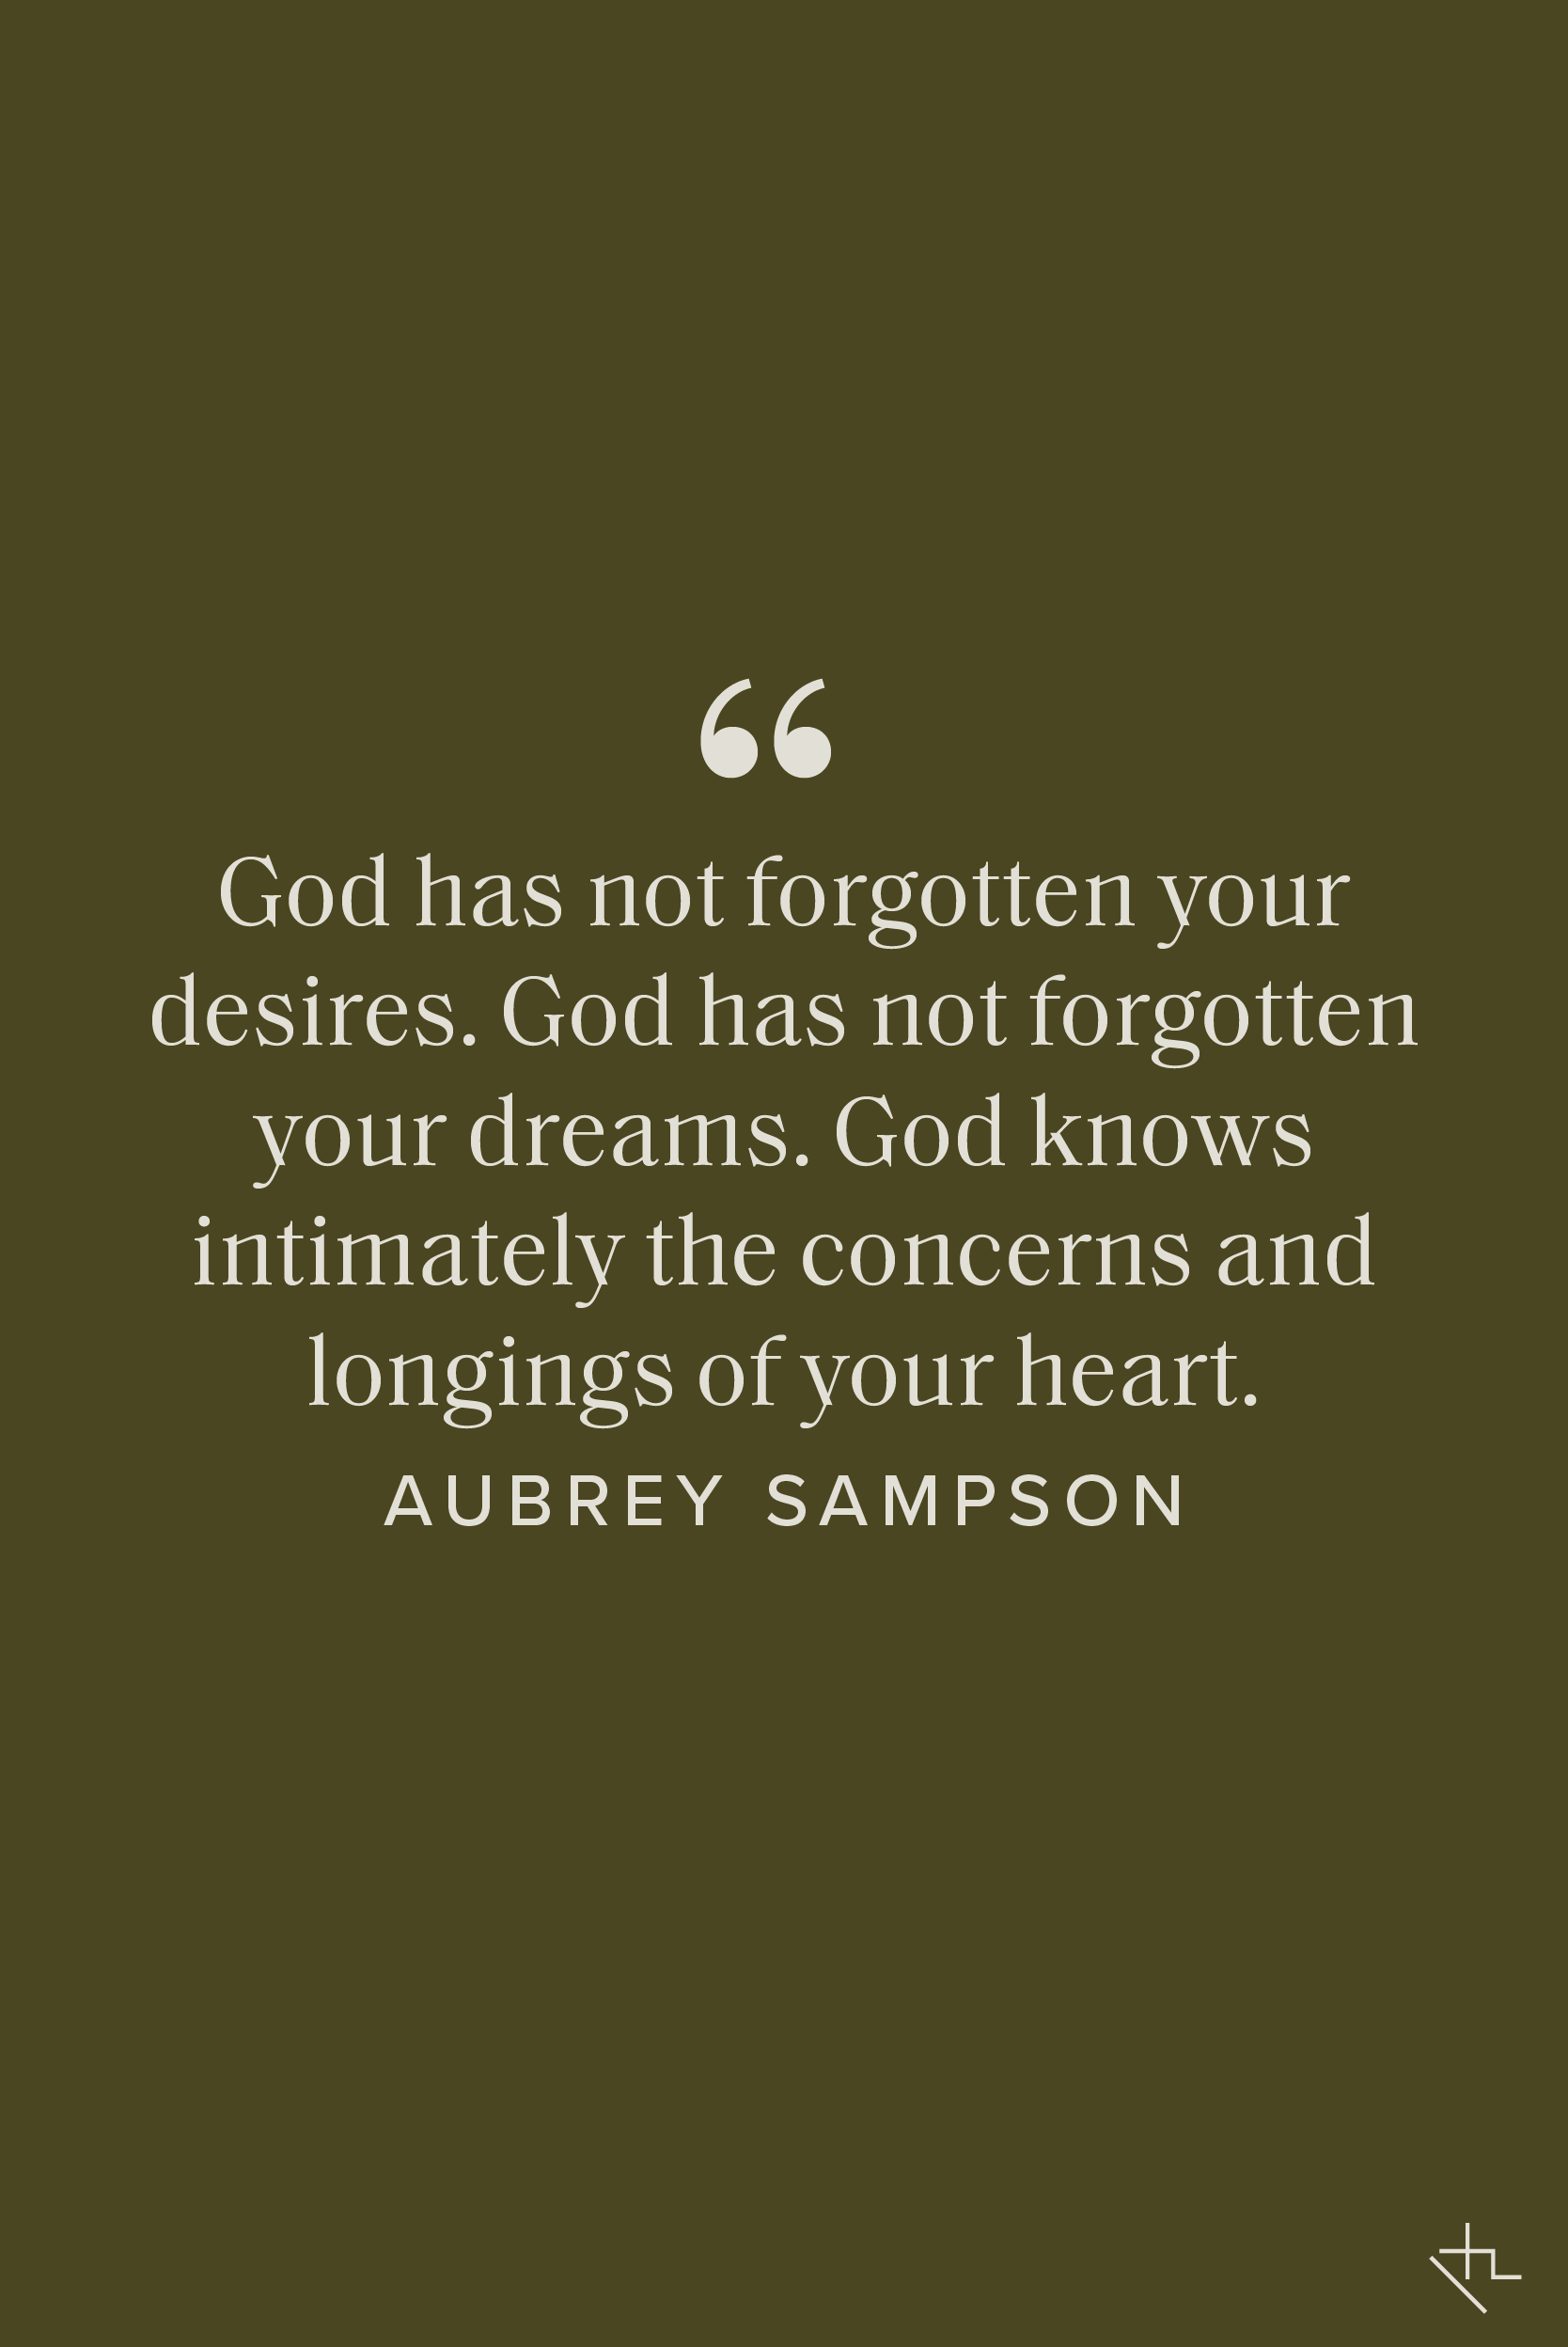 Aubrey Sampson - Pinterest Image